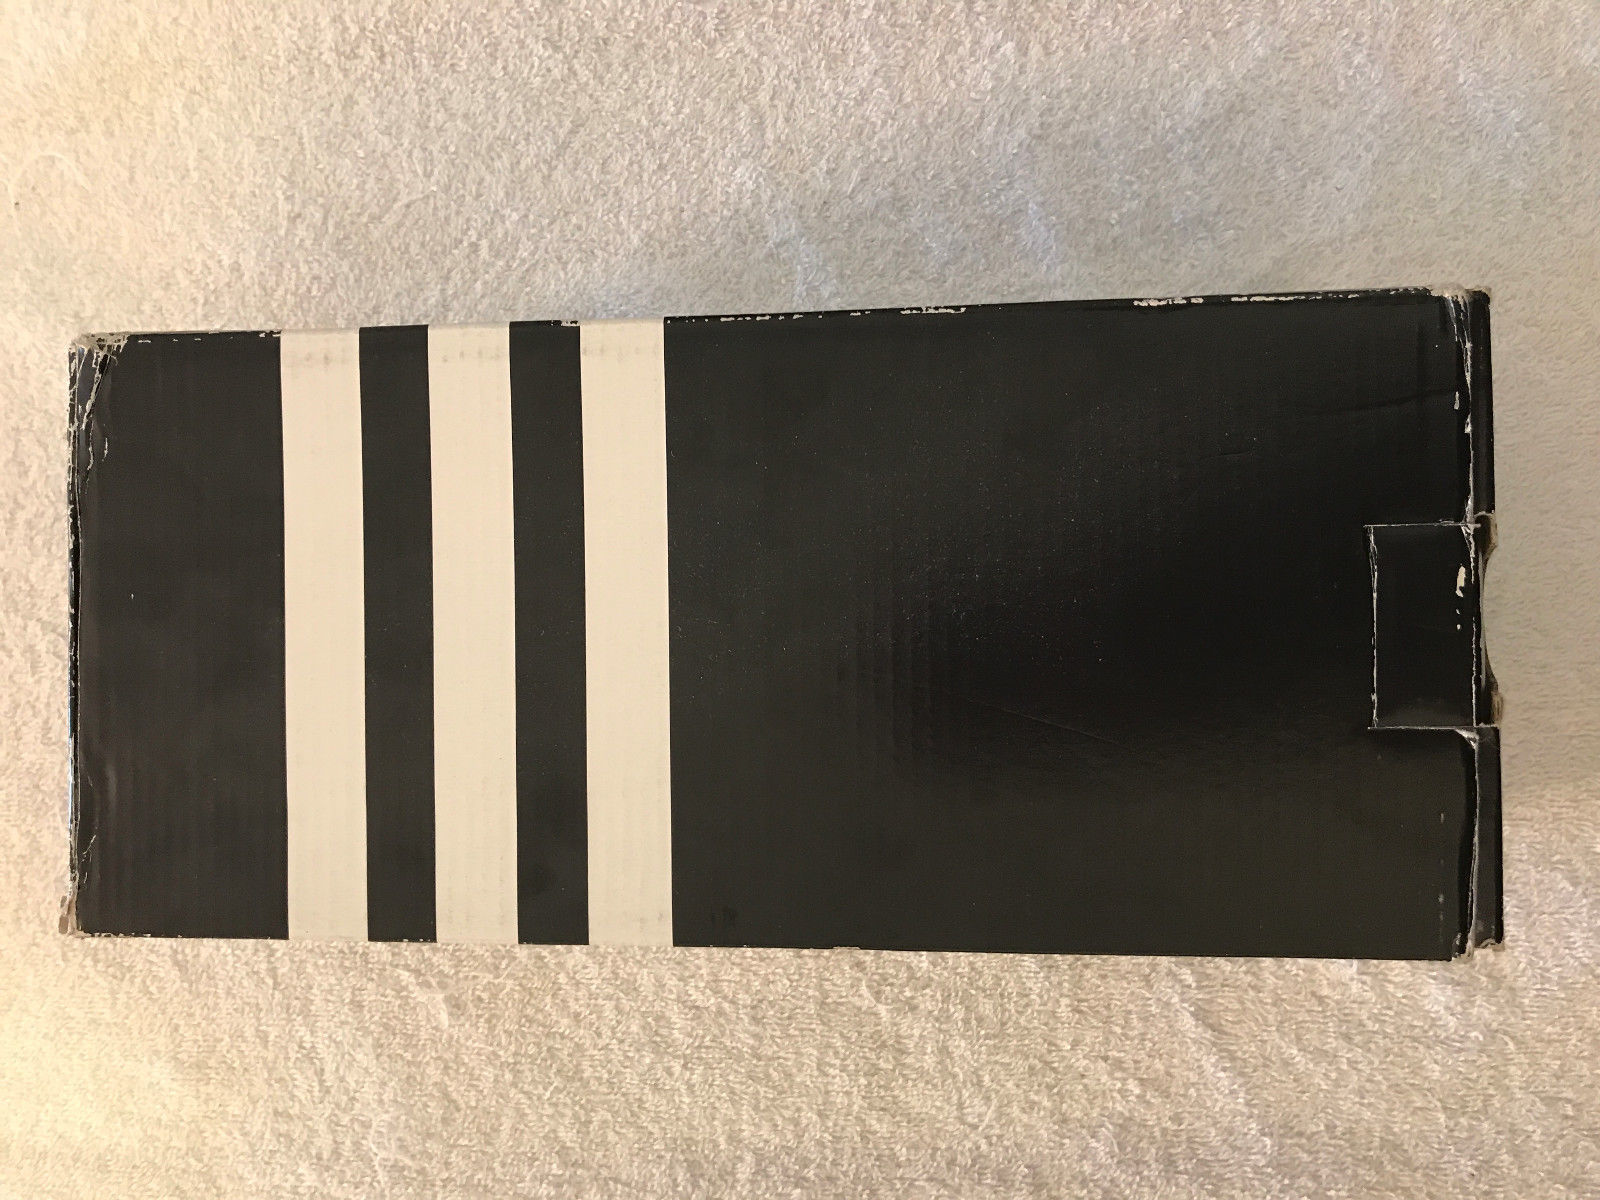 34df56a7658f41 Adidas Duramo G15892 Mens Navy White Slides Flip Flops Sandals Size 9